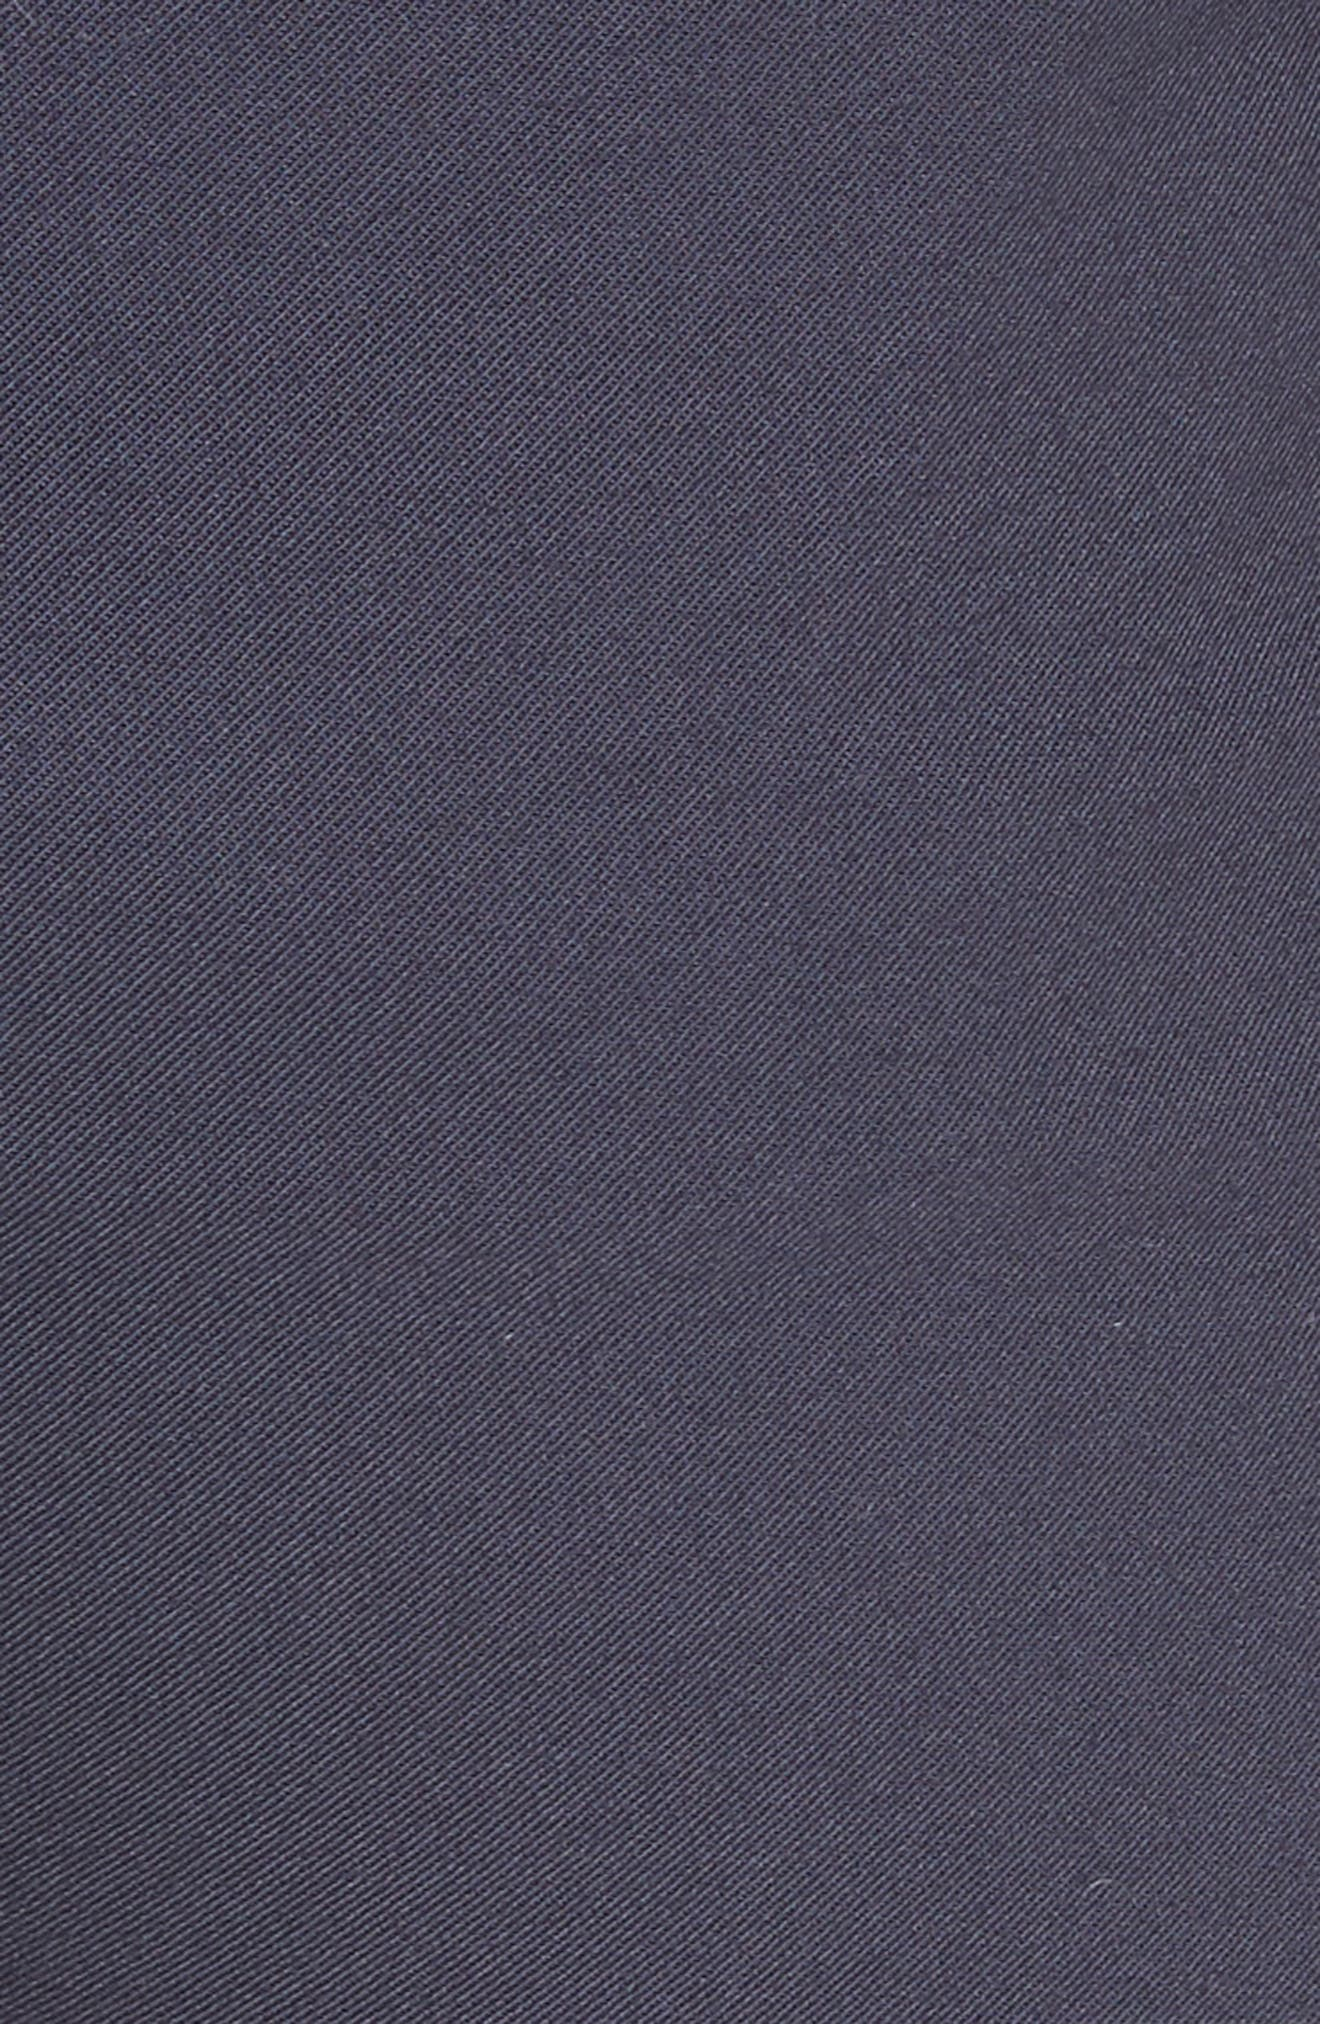 Eyelet Trim Stretch Twill Crop Pants,                             Alternate thumbnail 5, color,                             400